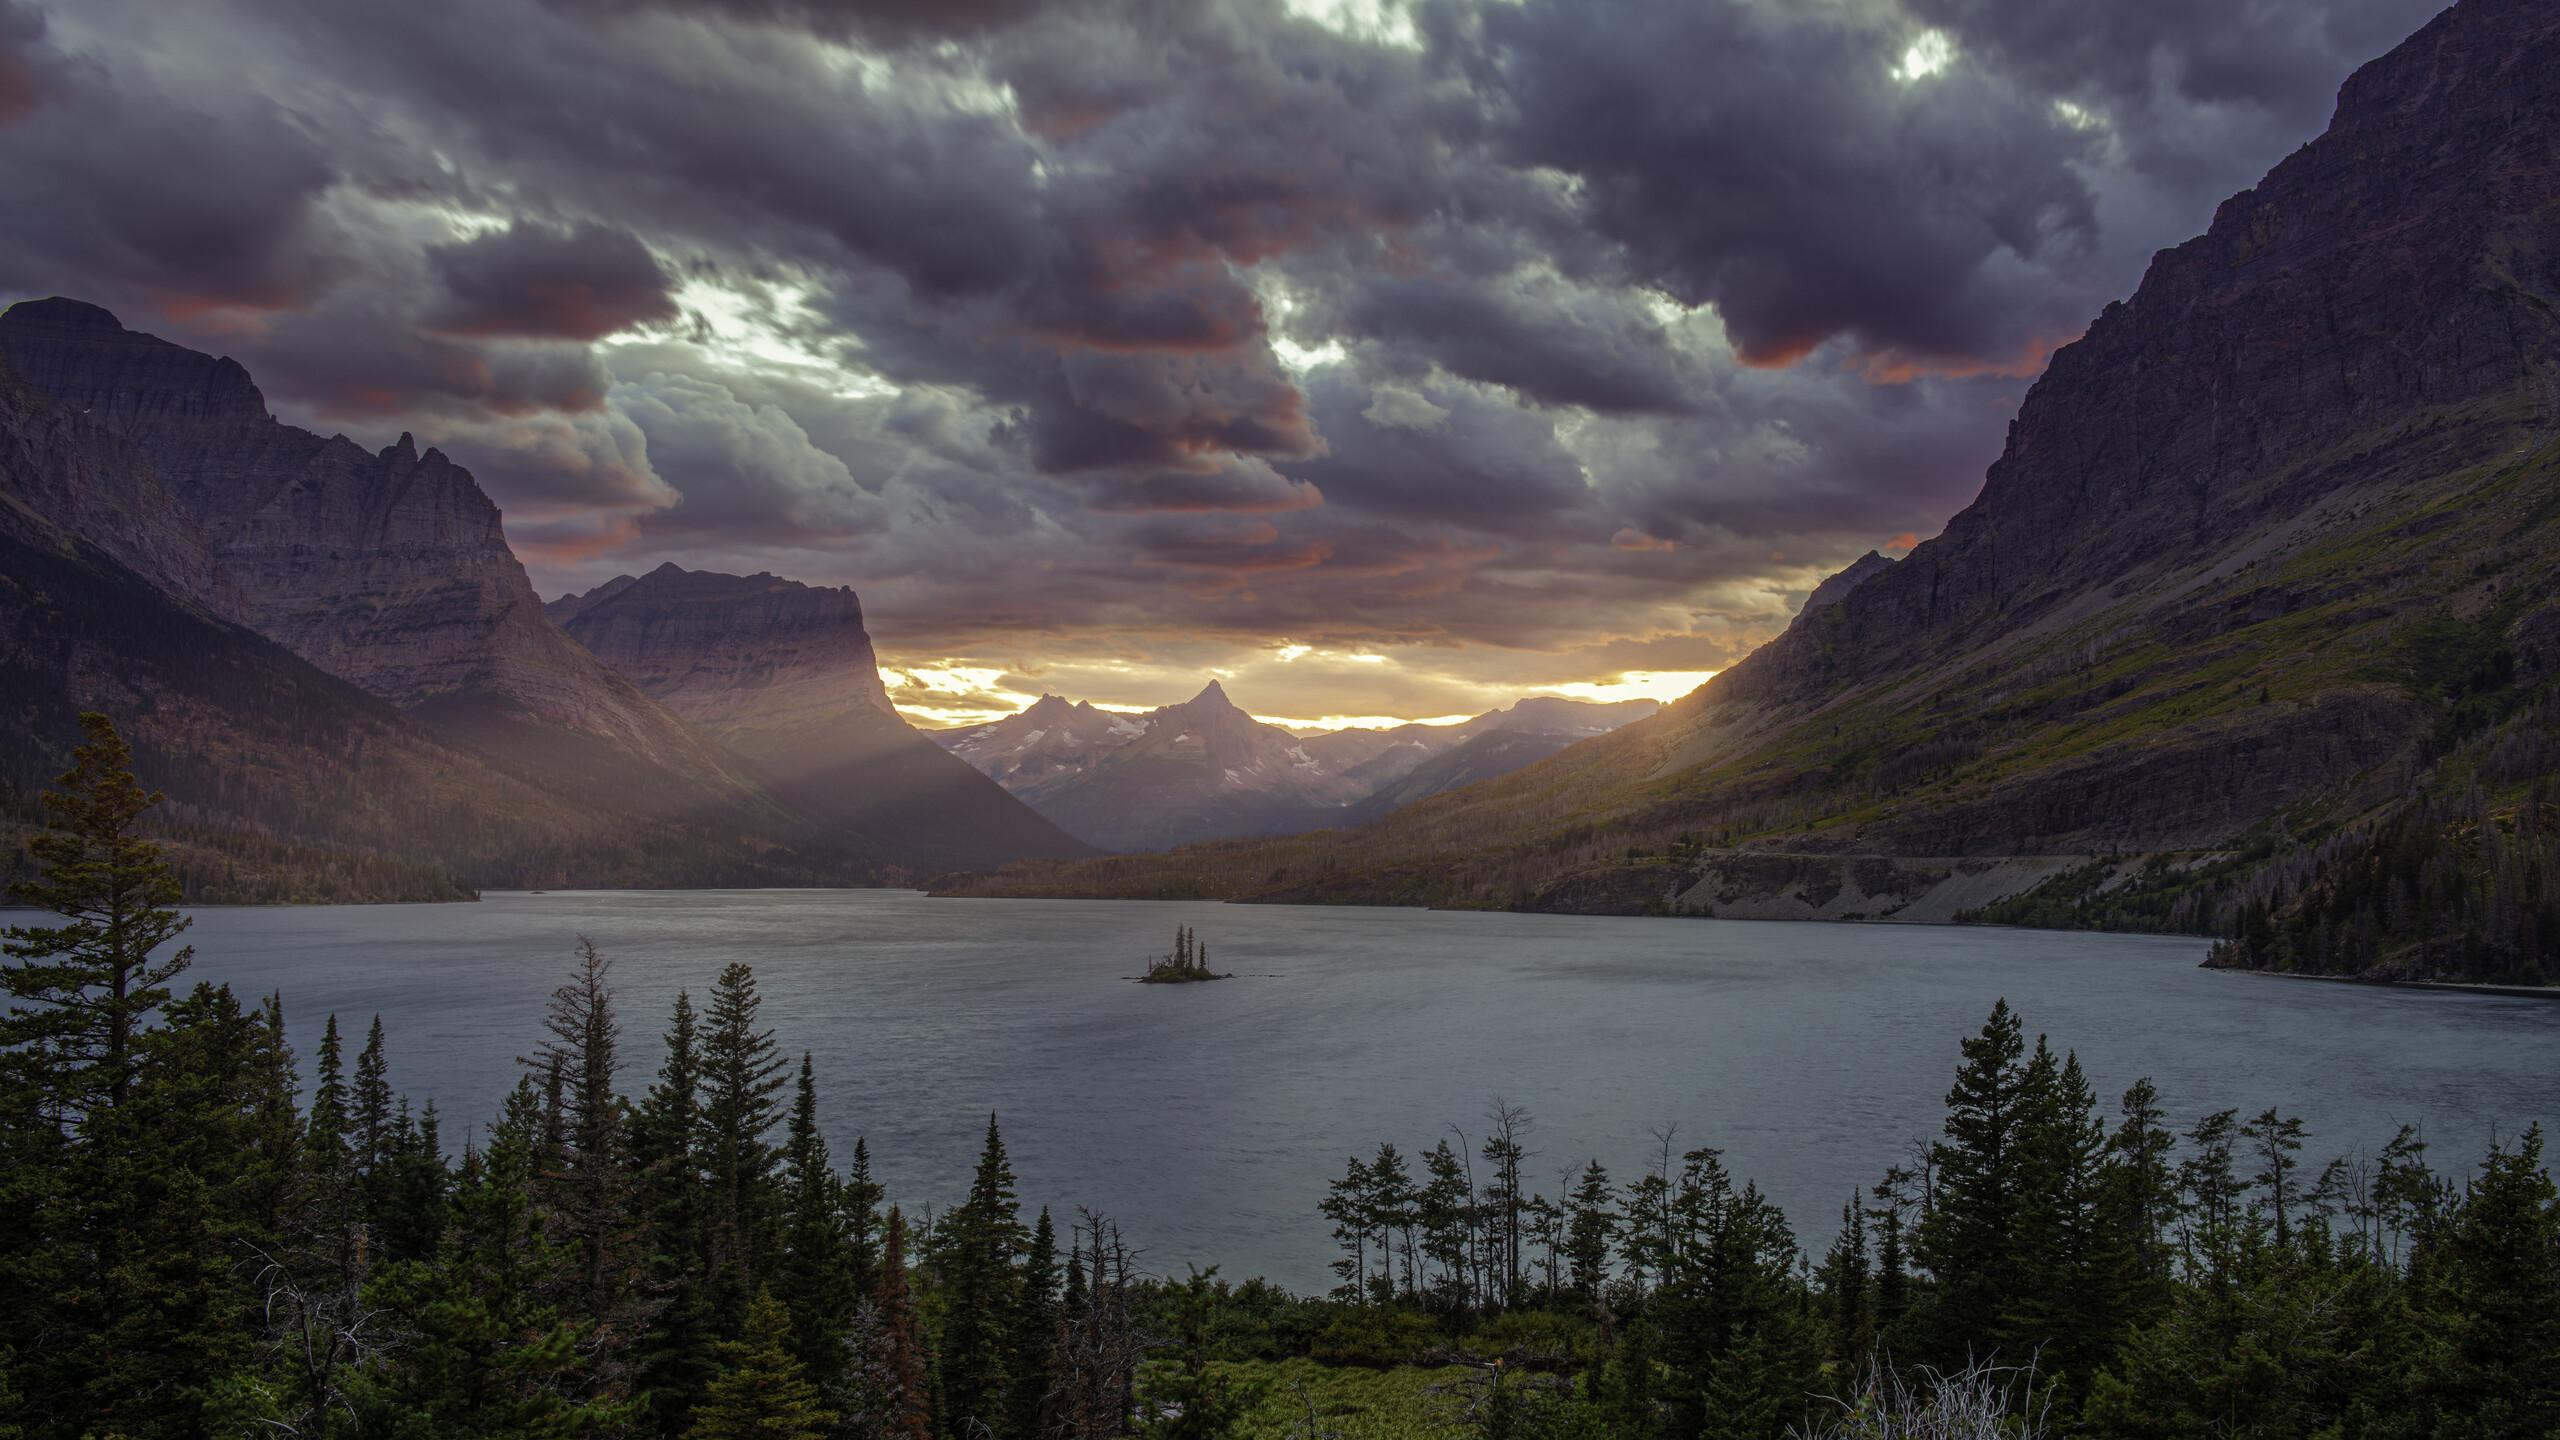 2560x1440 Sunset At St Mary Lake Glacier National Park 5k 1440p